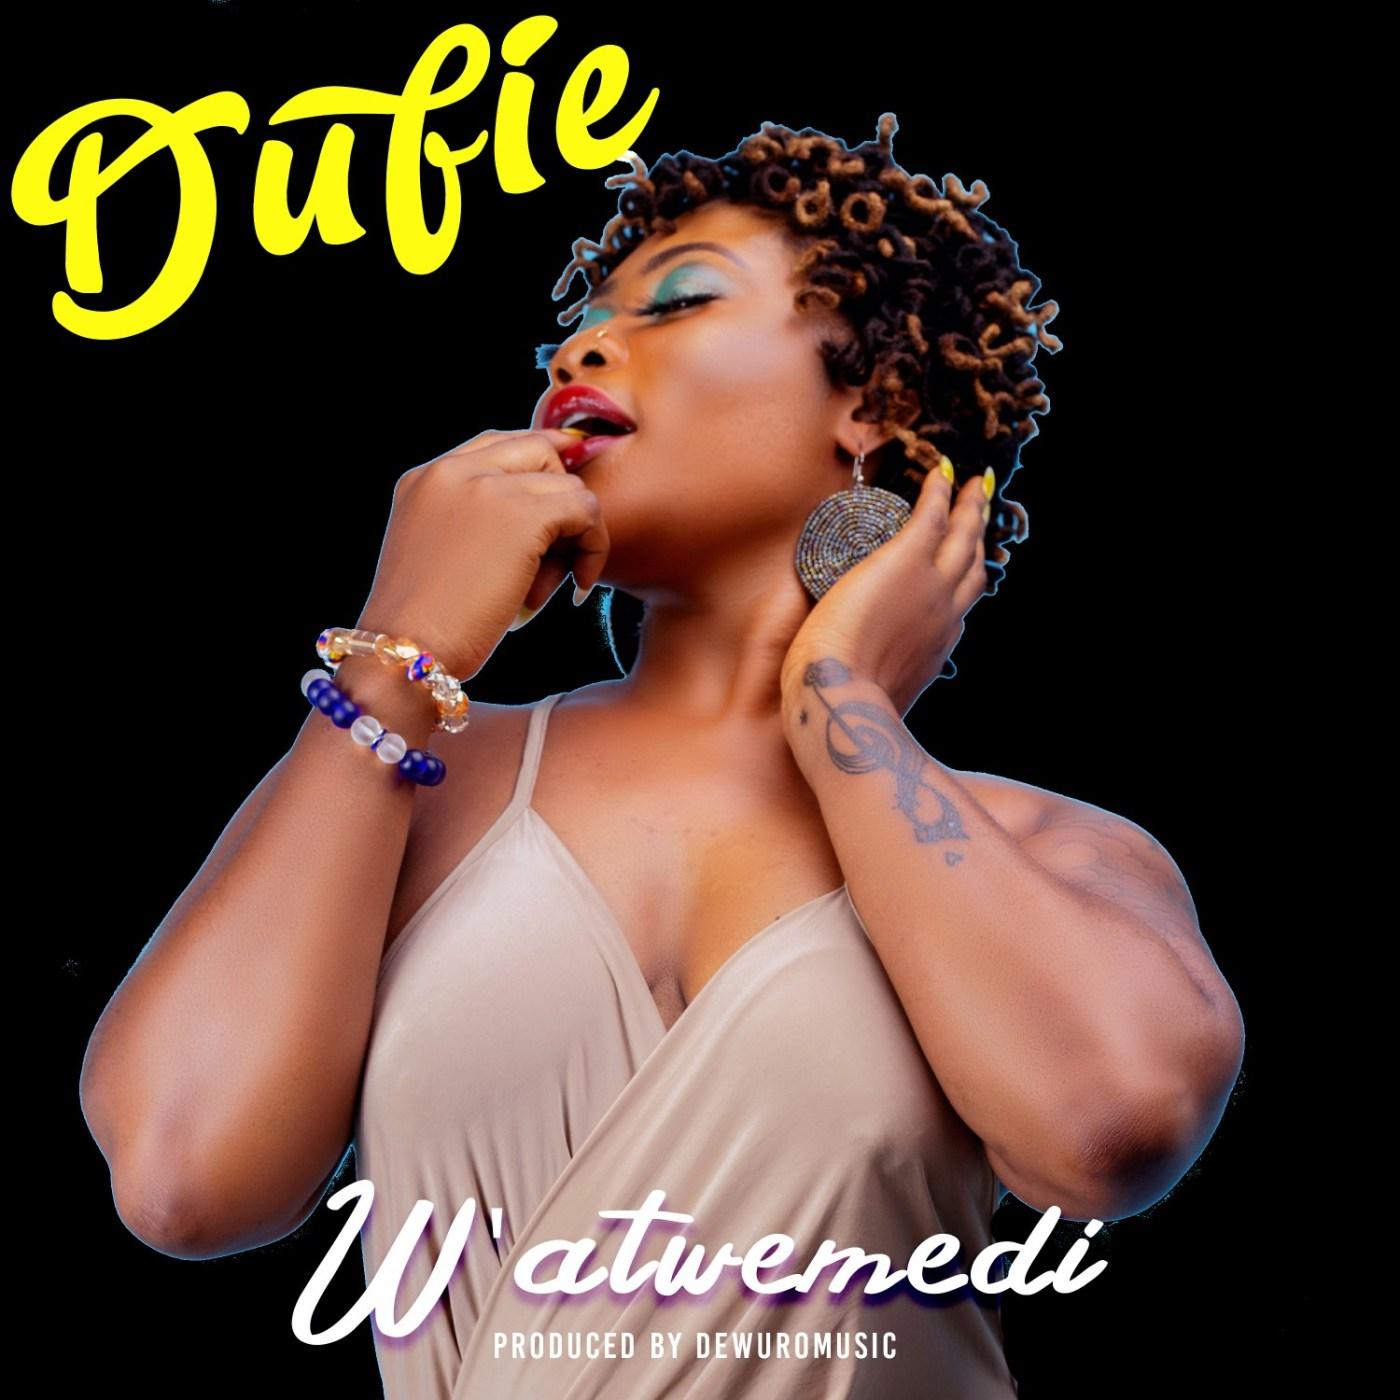 Dufie - W'atwe Medi